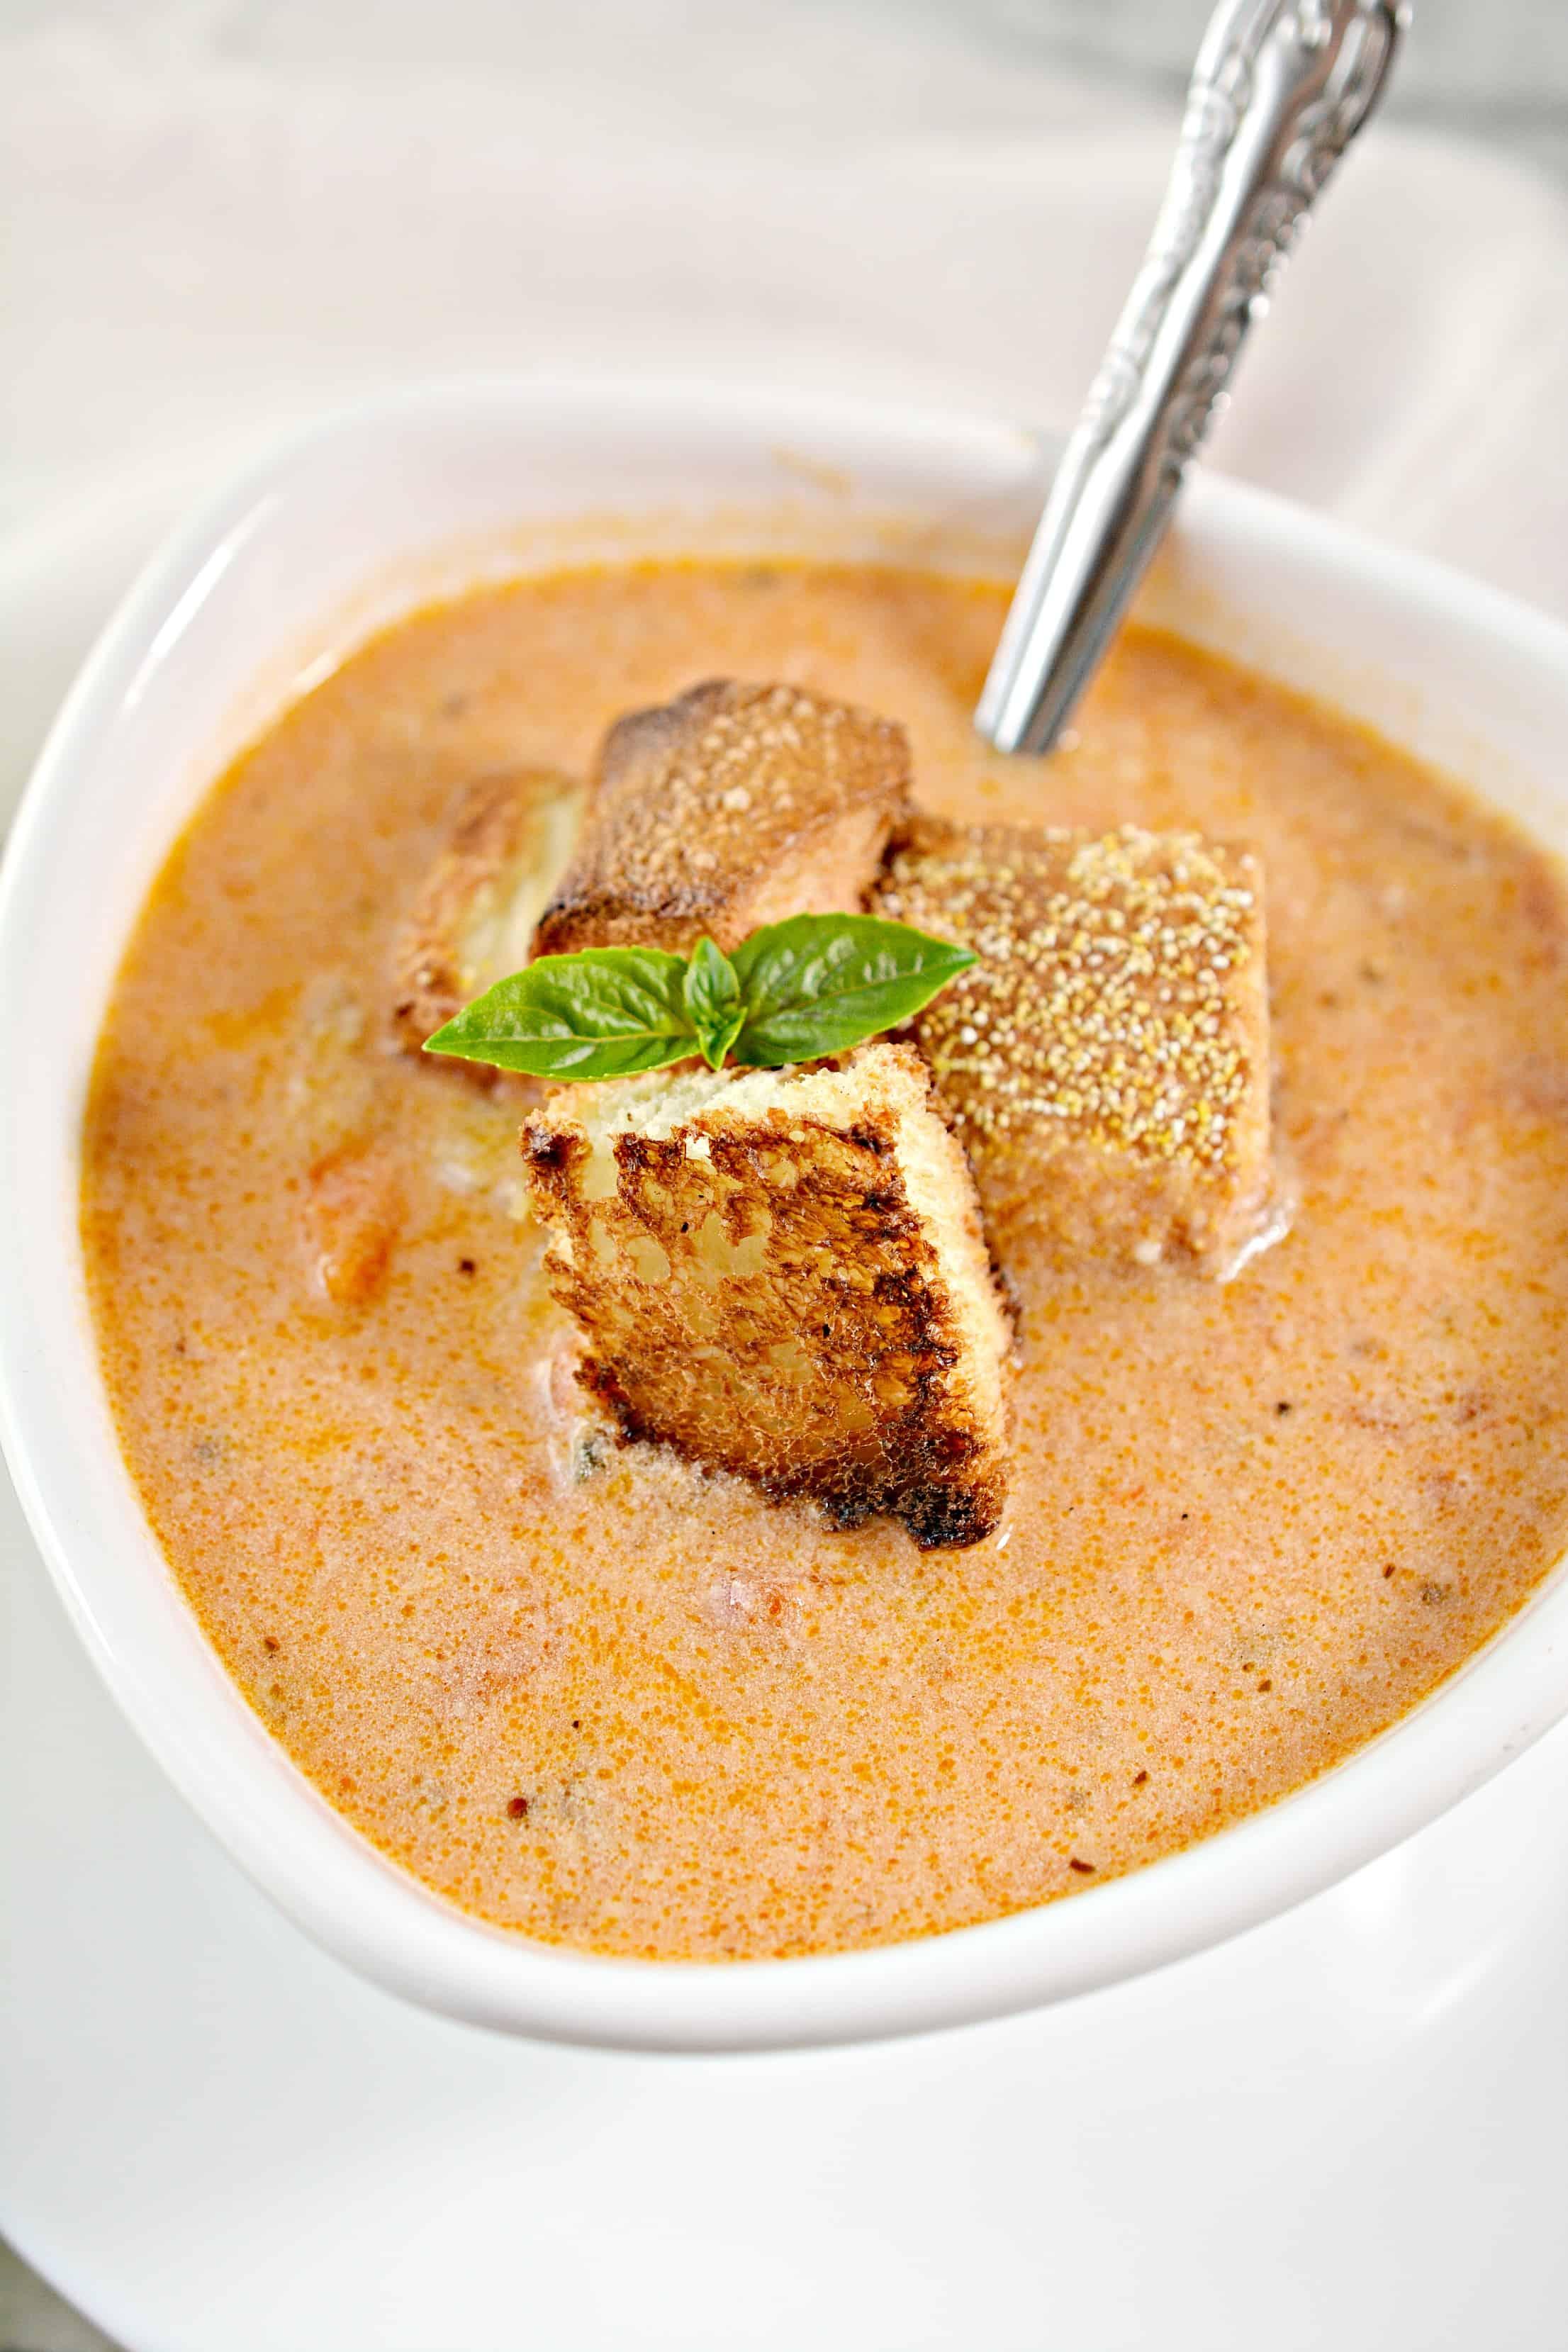 Instant Pot easy tomato soup recipe